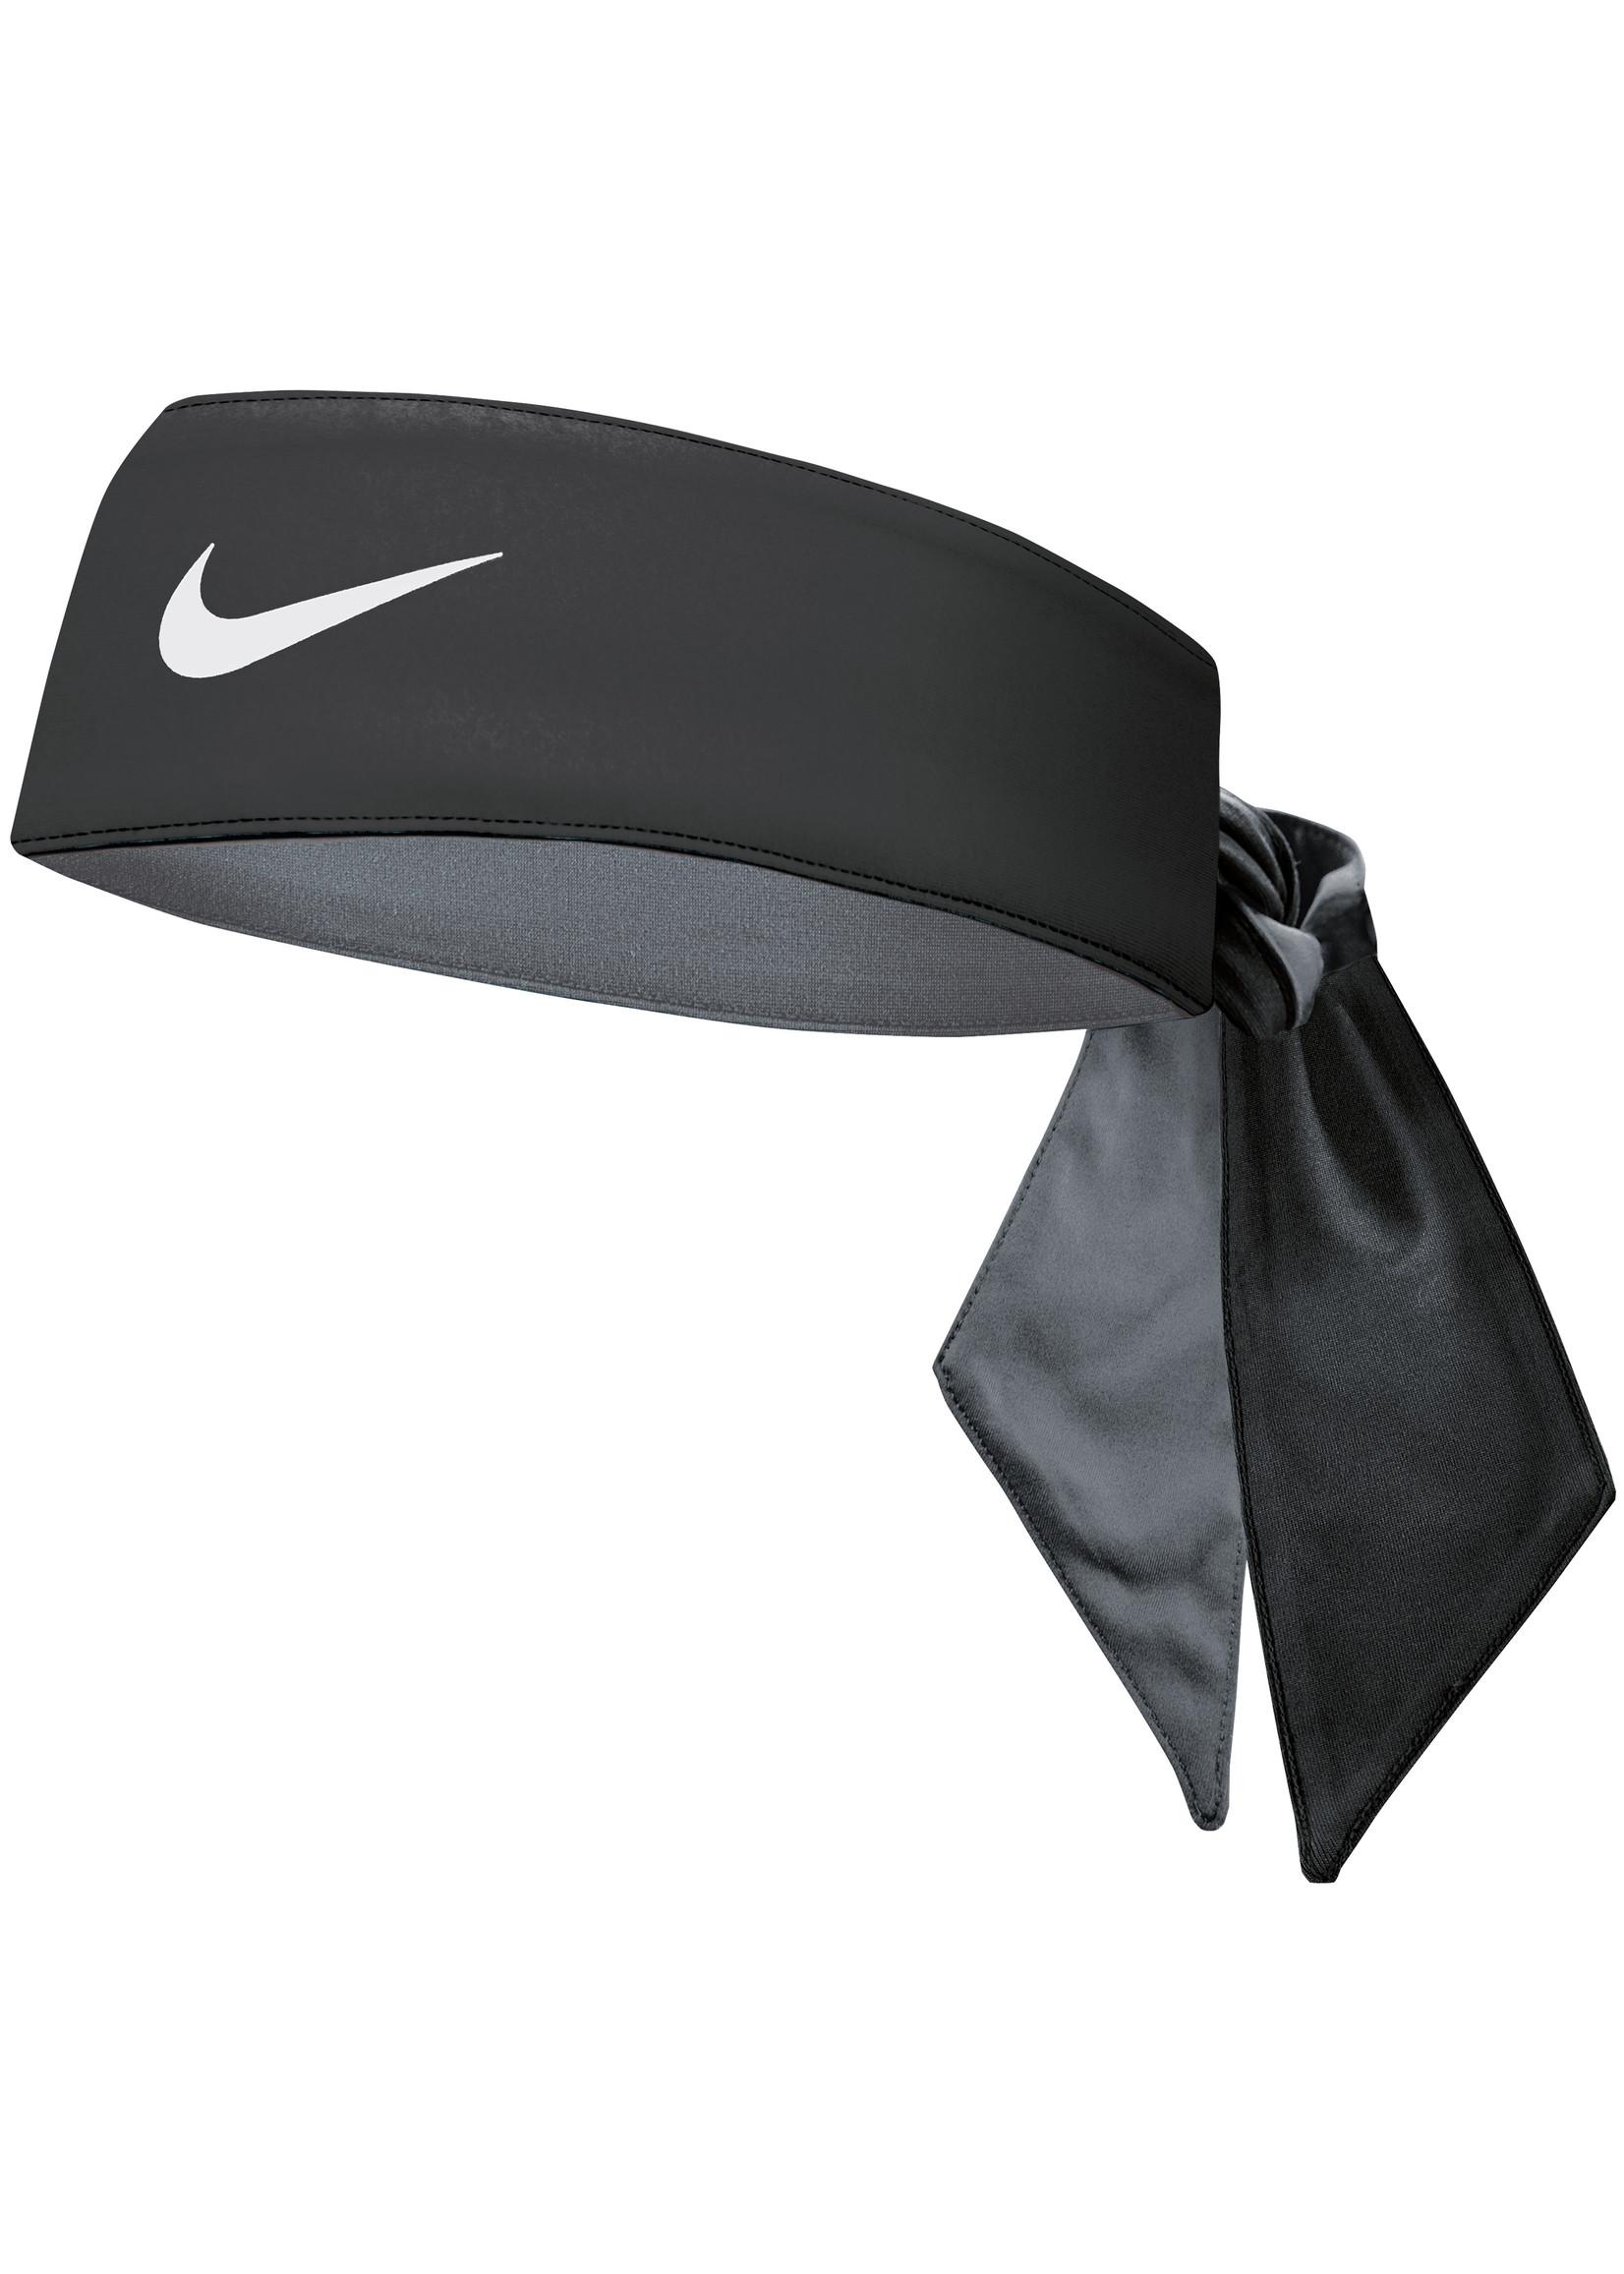 Nike Cooling Head Tie Black/Grey/White